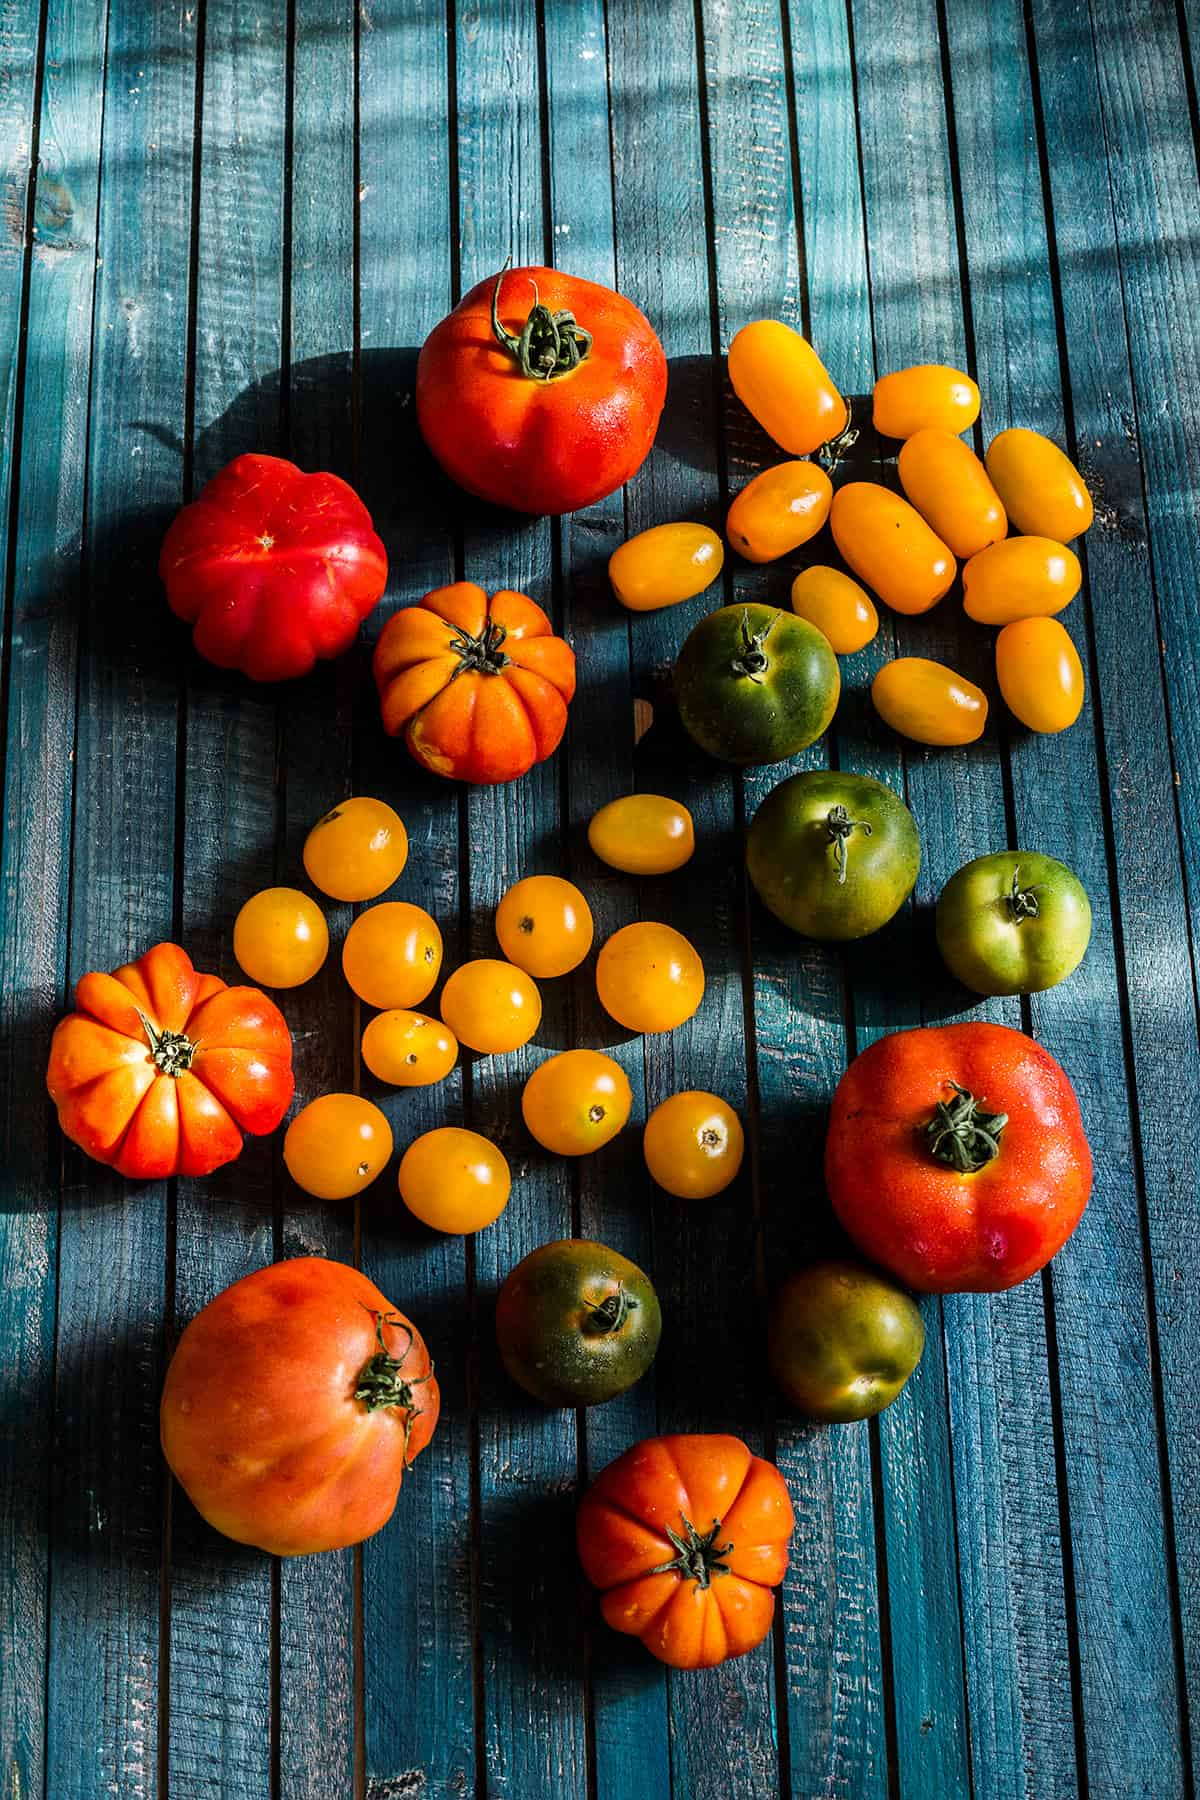 Late-summer heirloom tomatoes